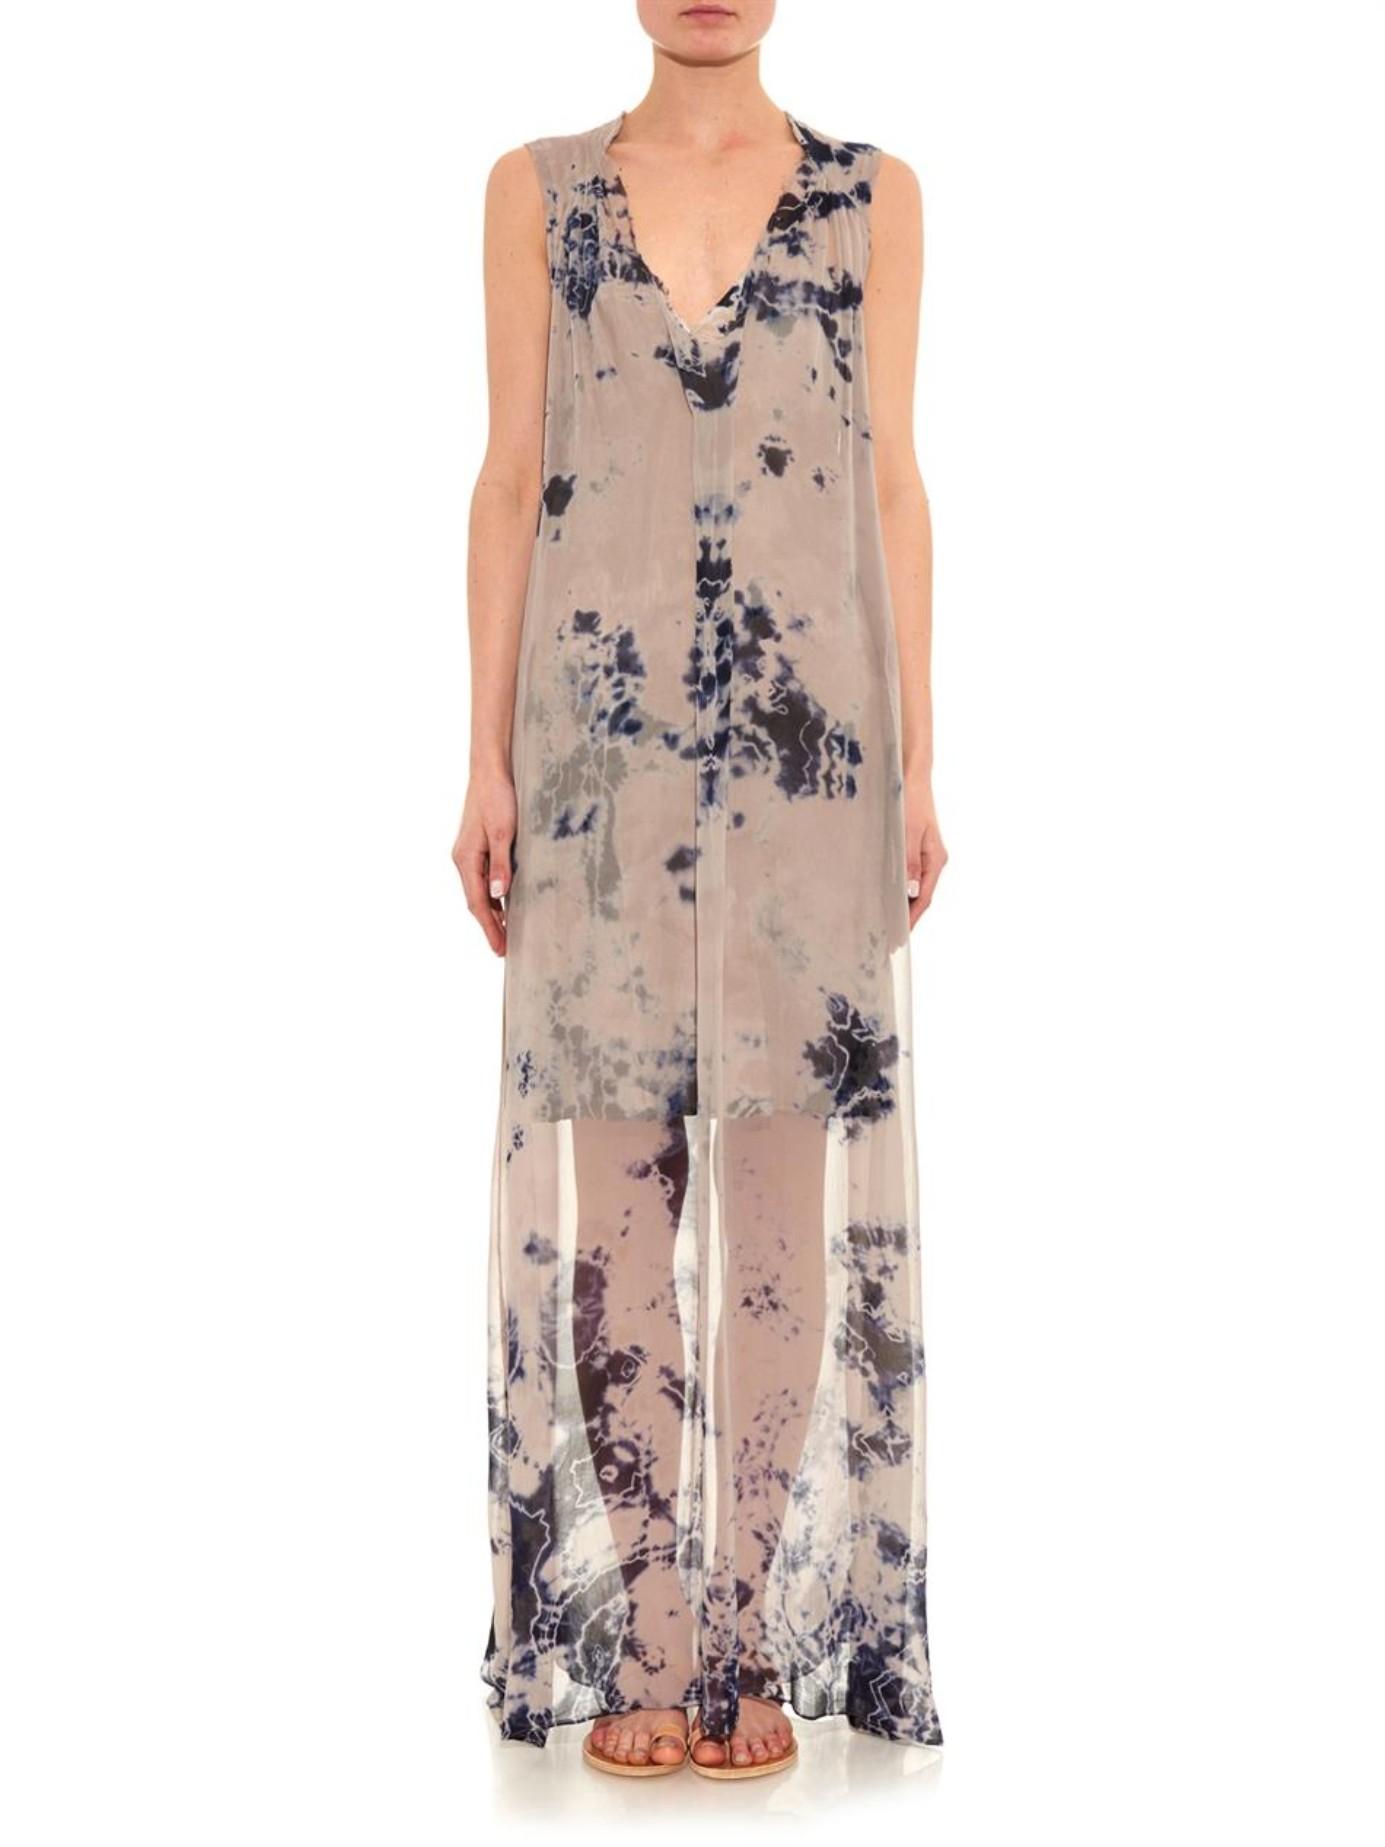 Raquel allegra Tie-Dye Silk-Chiffon Maxi Dress in Natural  Lyst